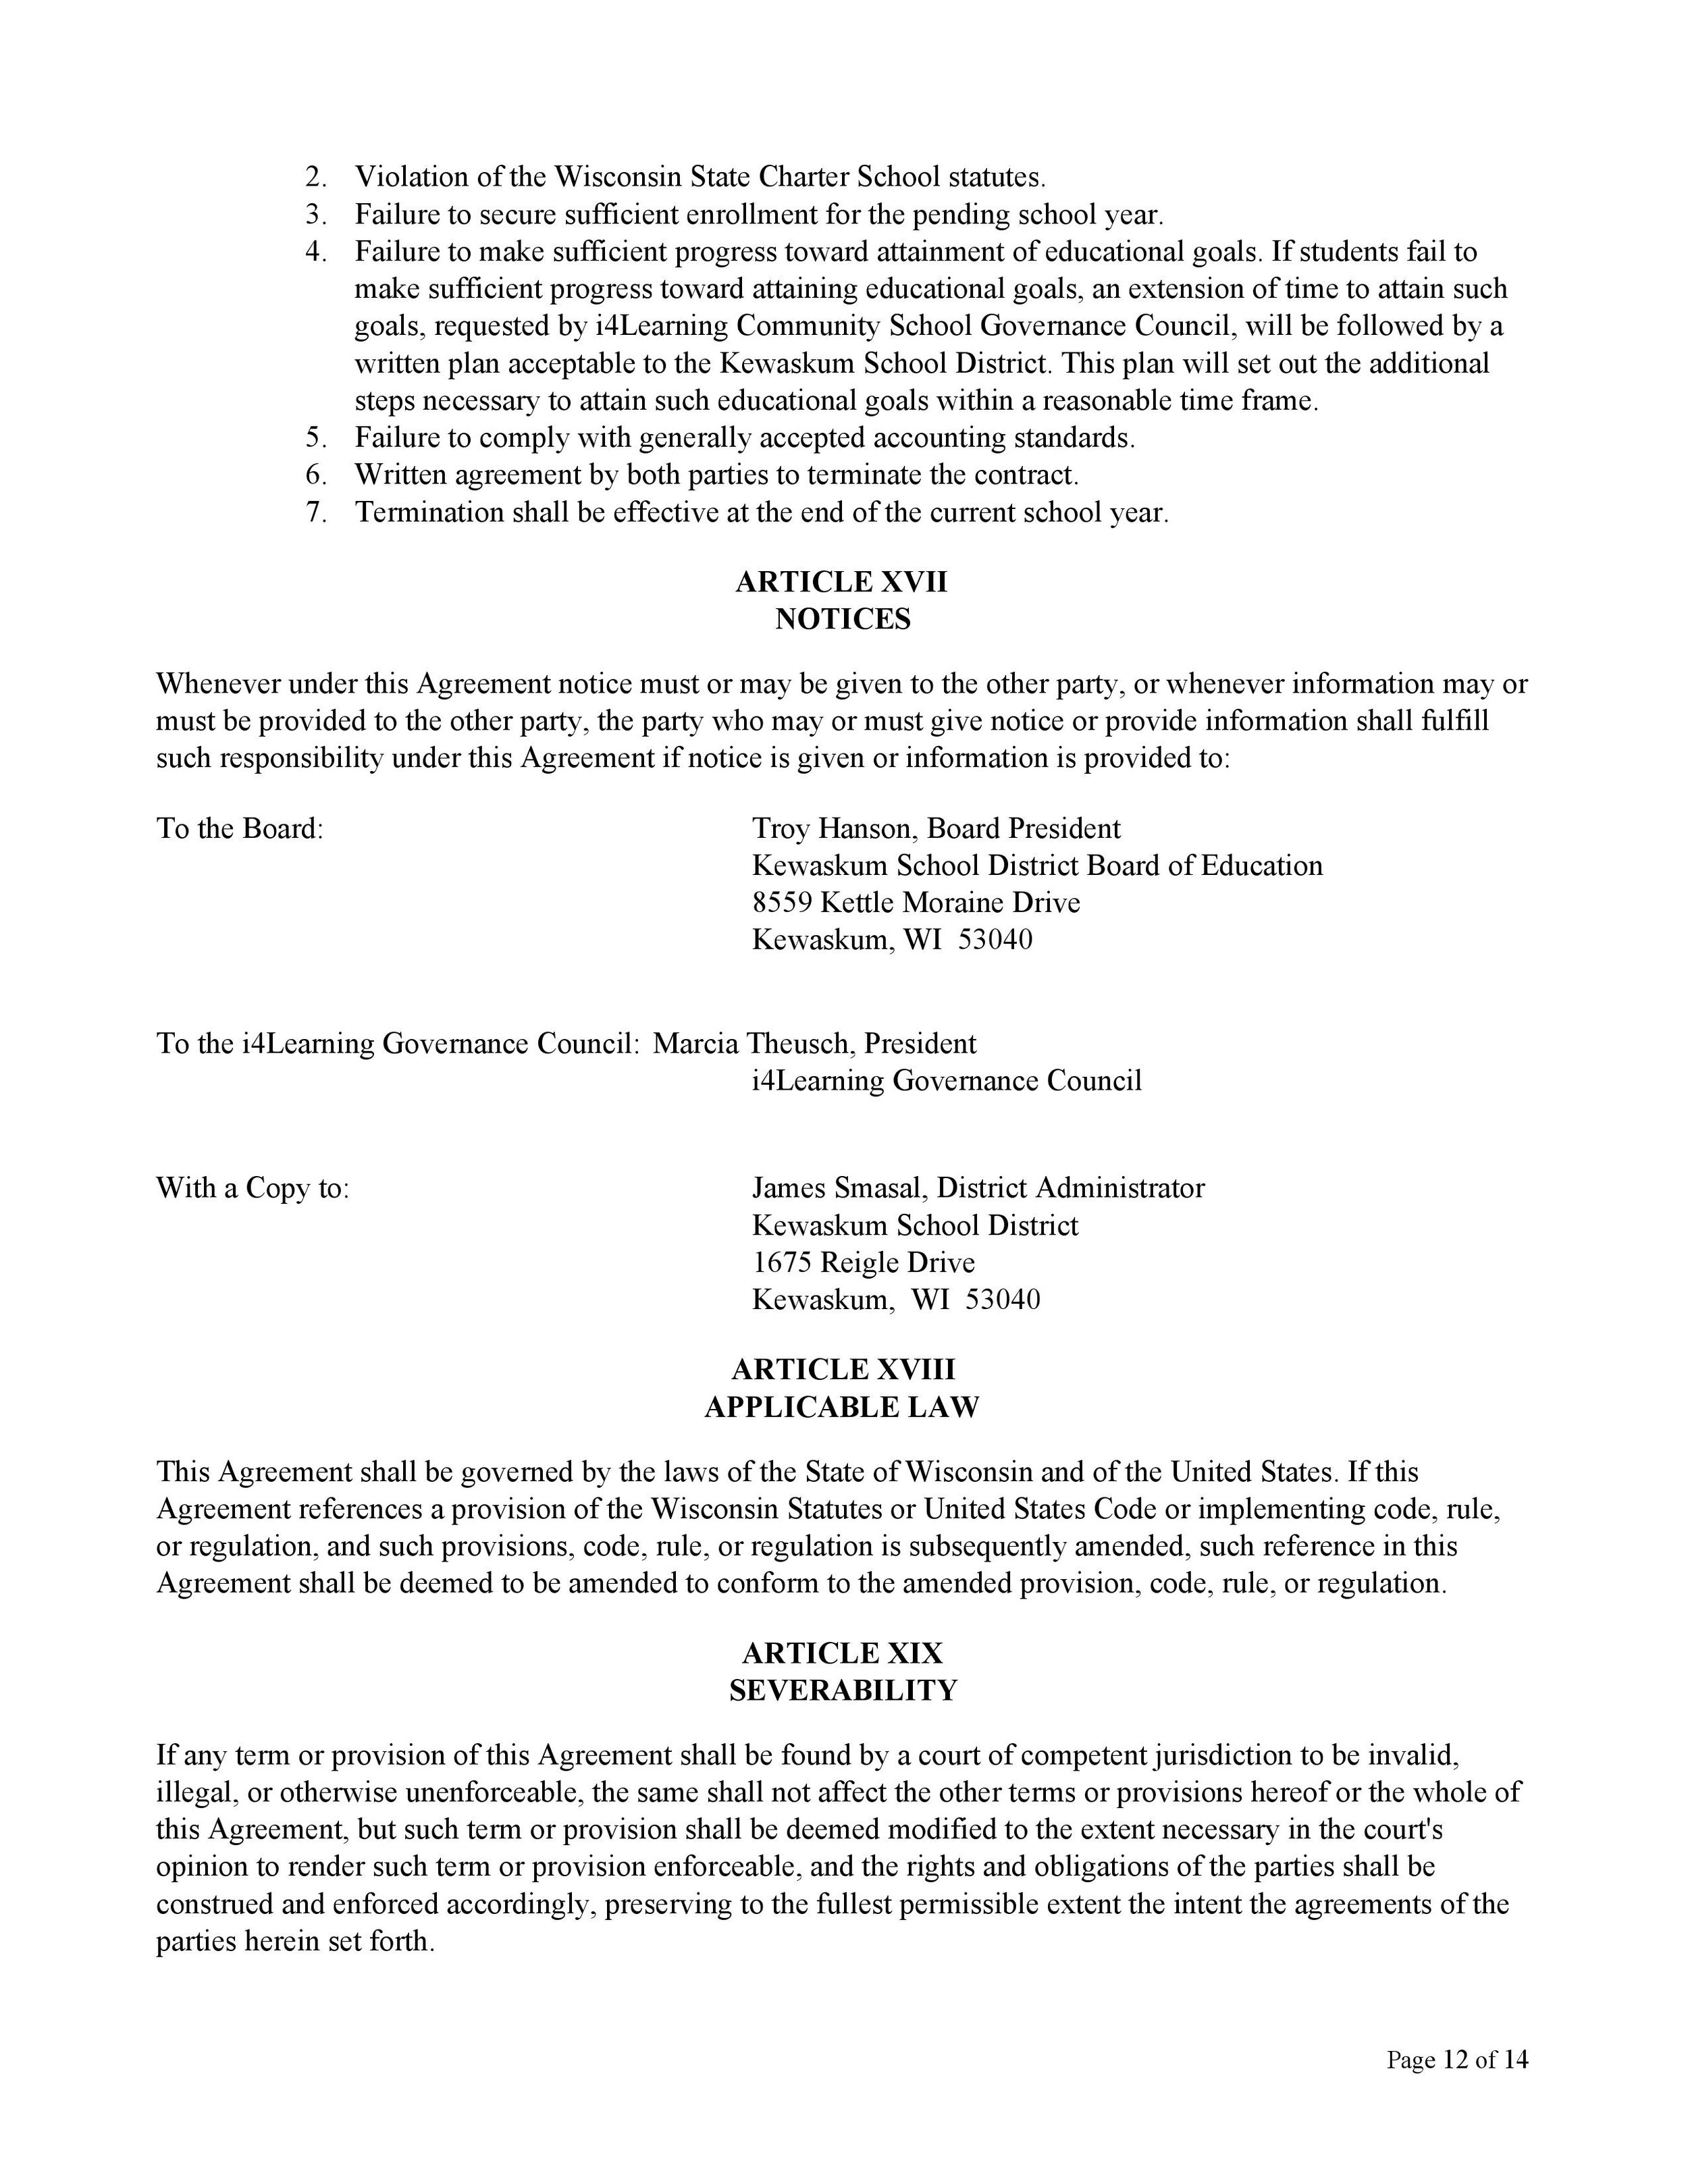 Contract pg 12.jpg